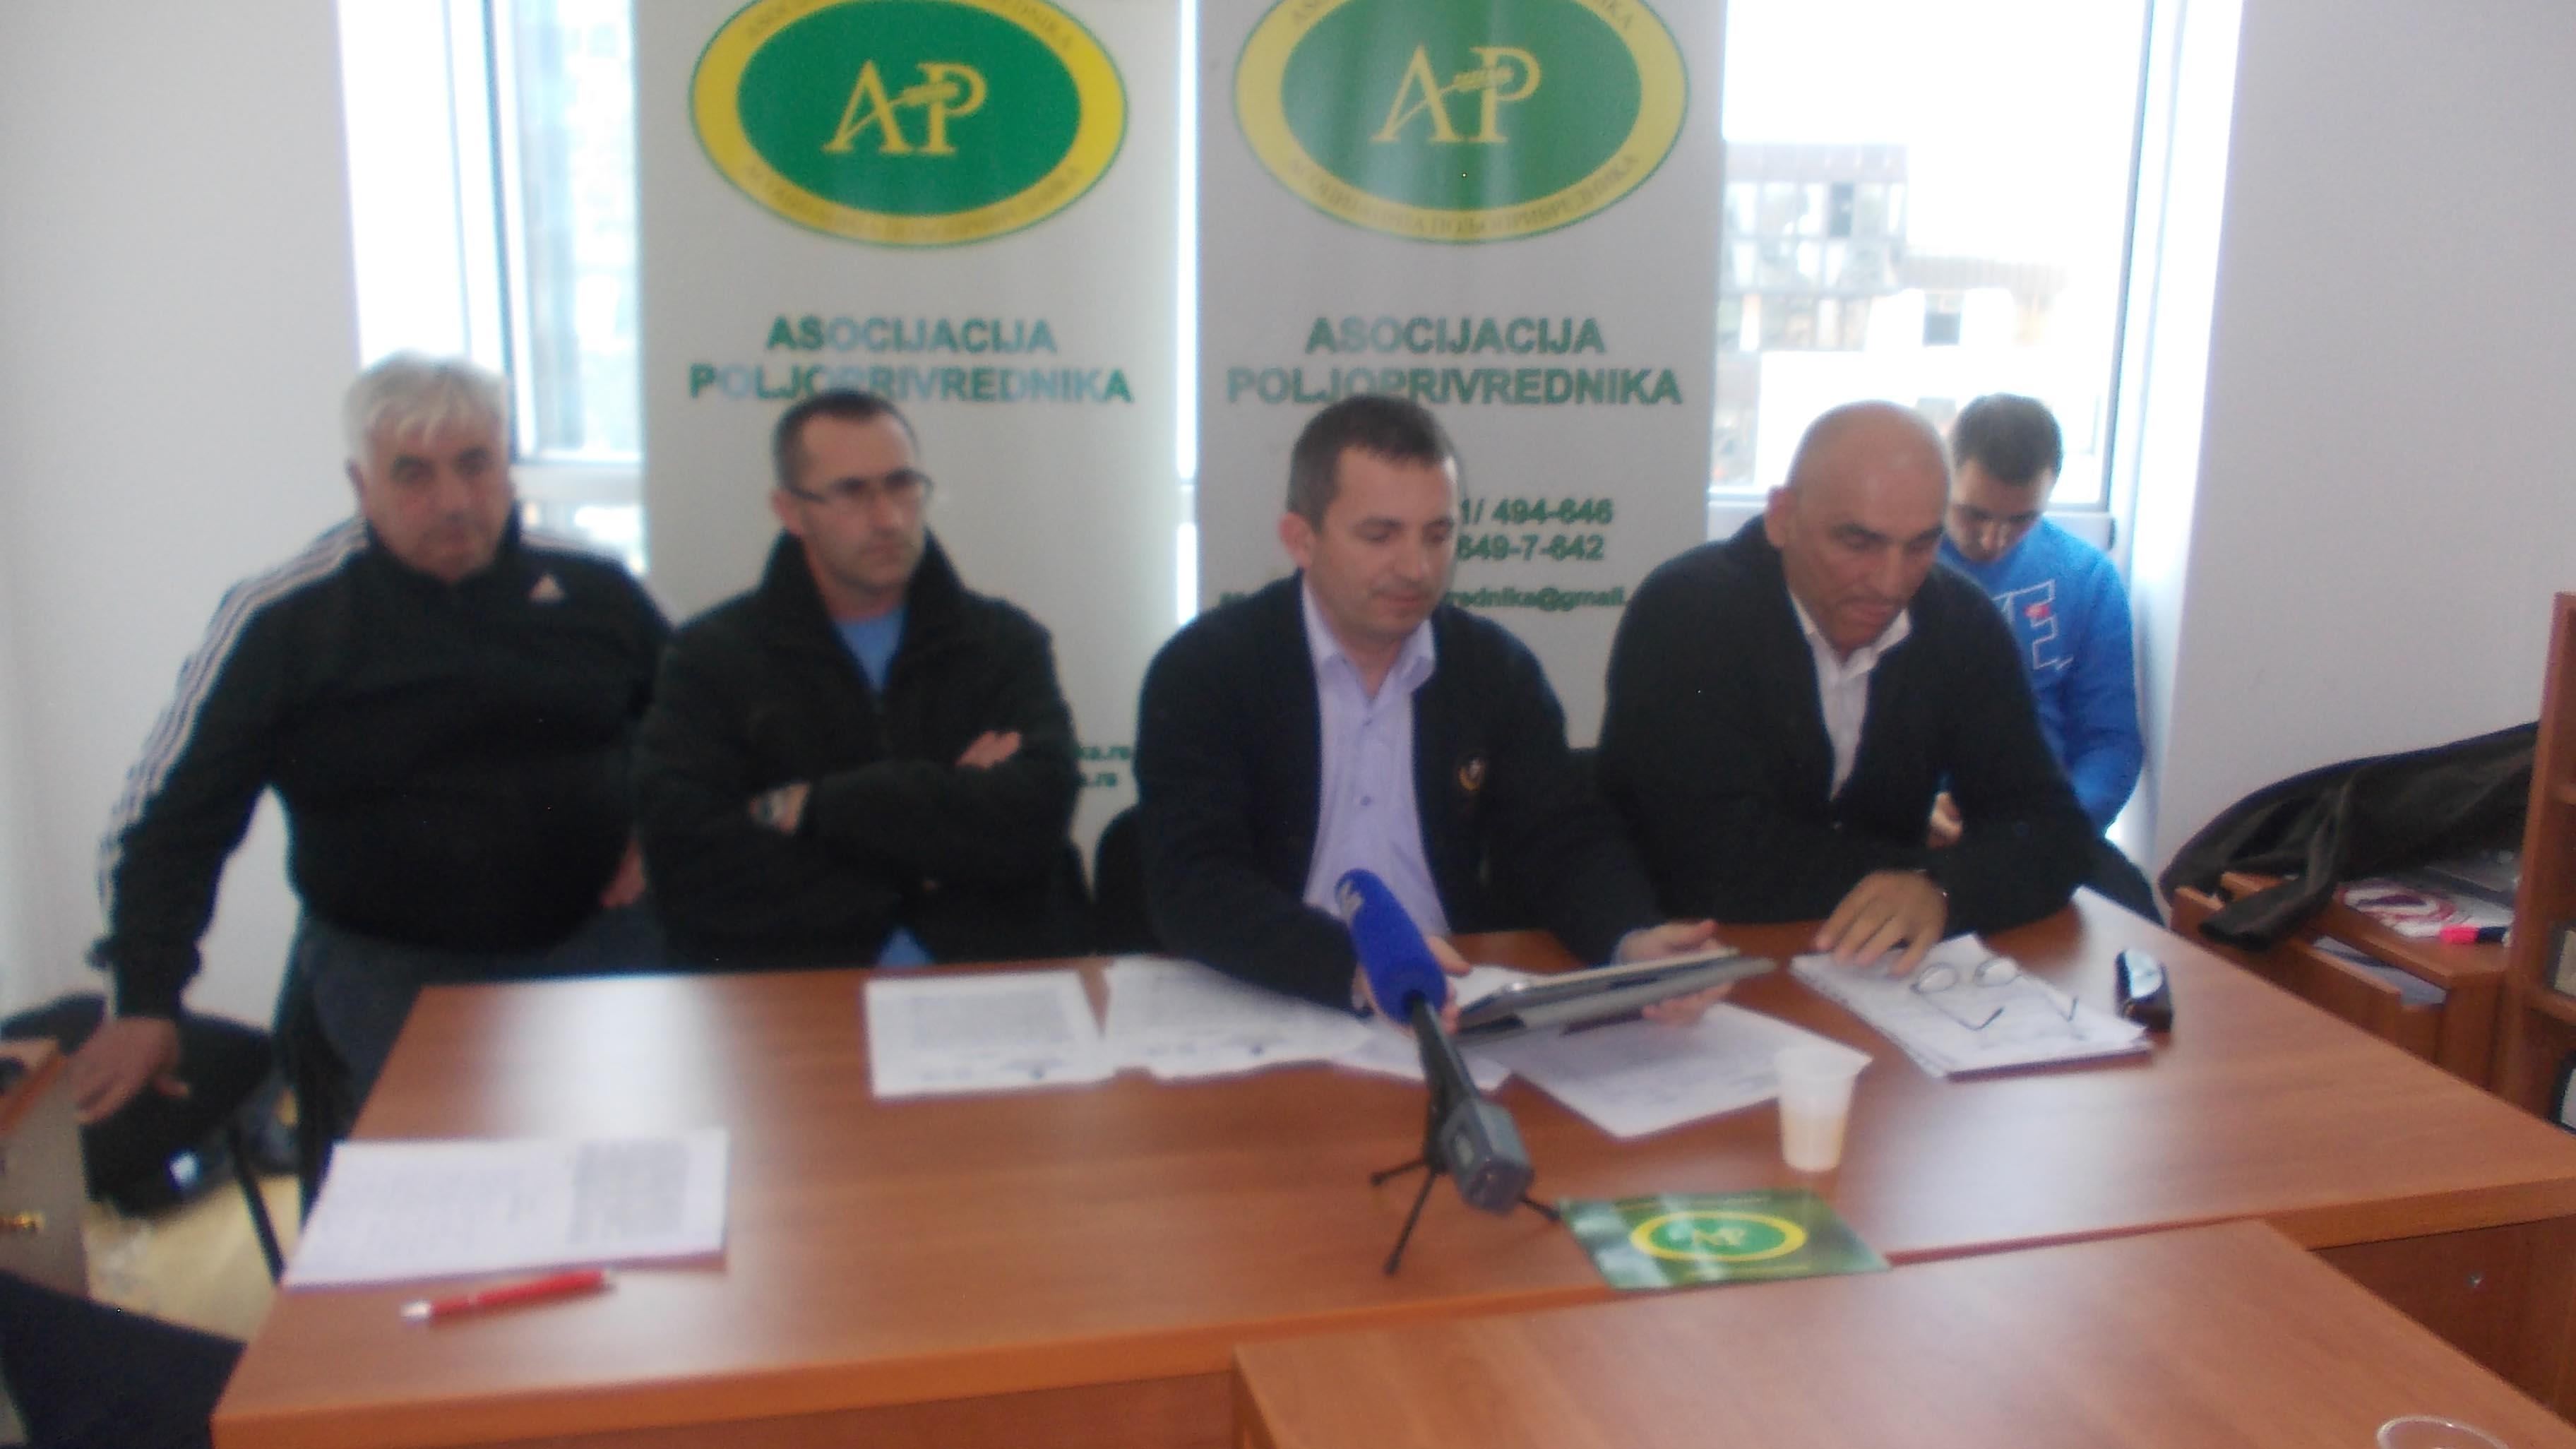 Asocijacija poljoprivrednika preti nadležnima krivičnim prijavama i protestima